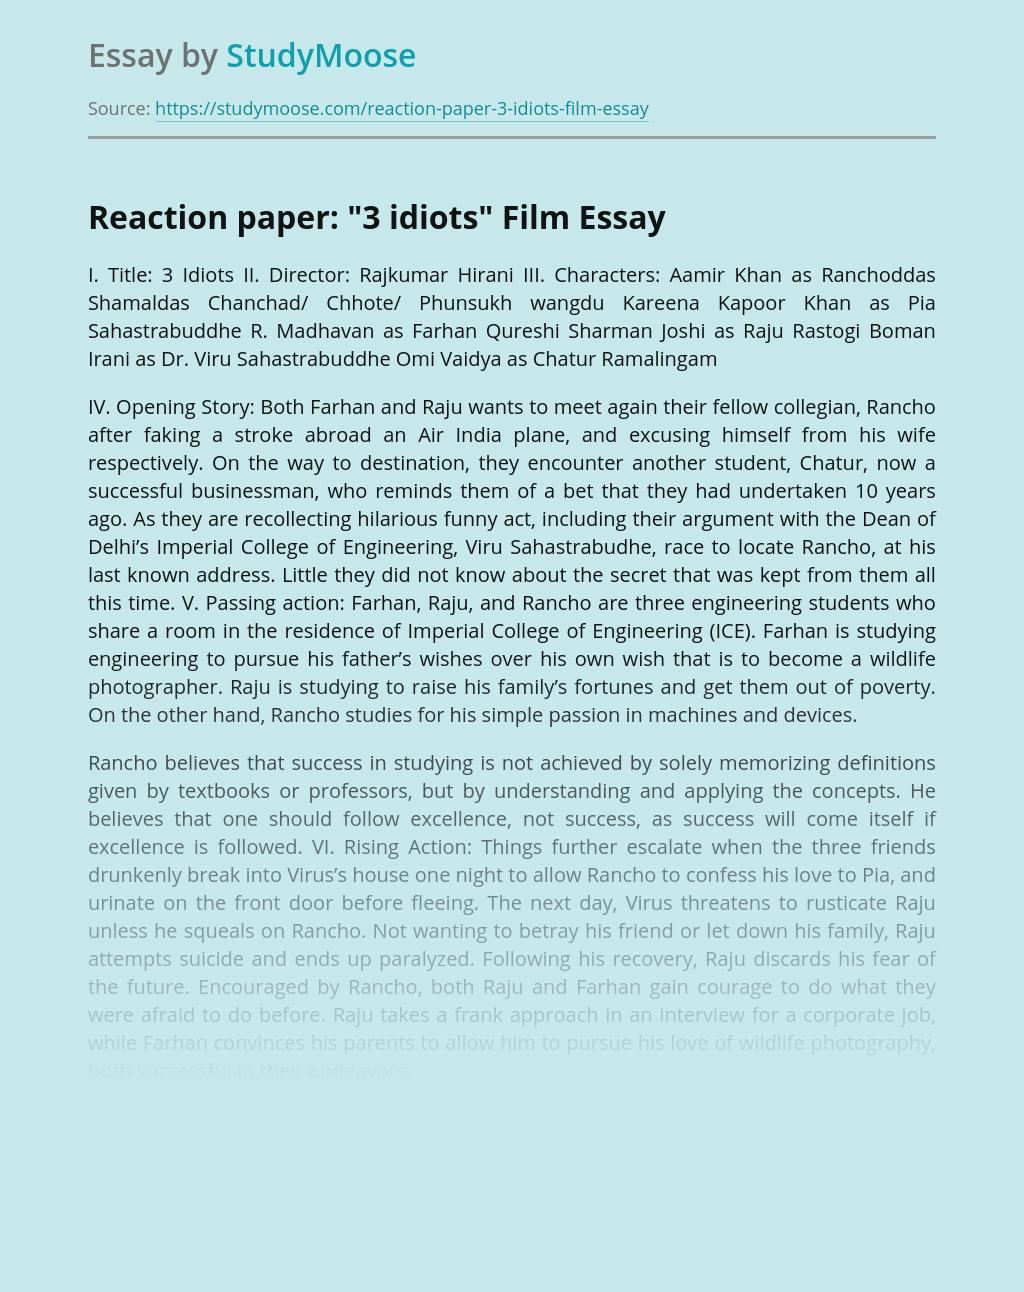 Reaction paper: